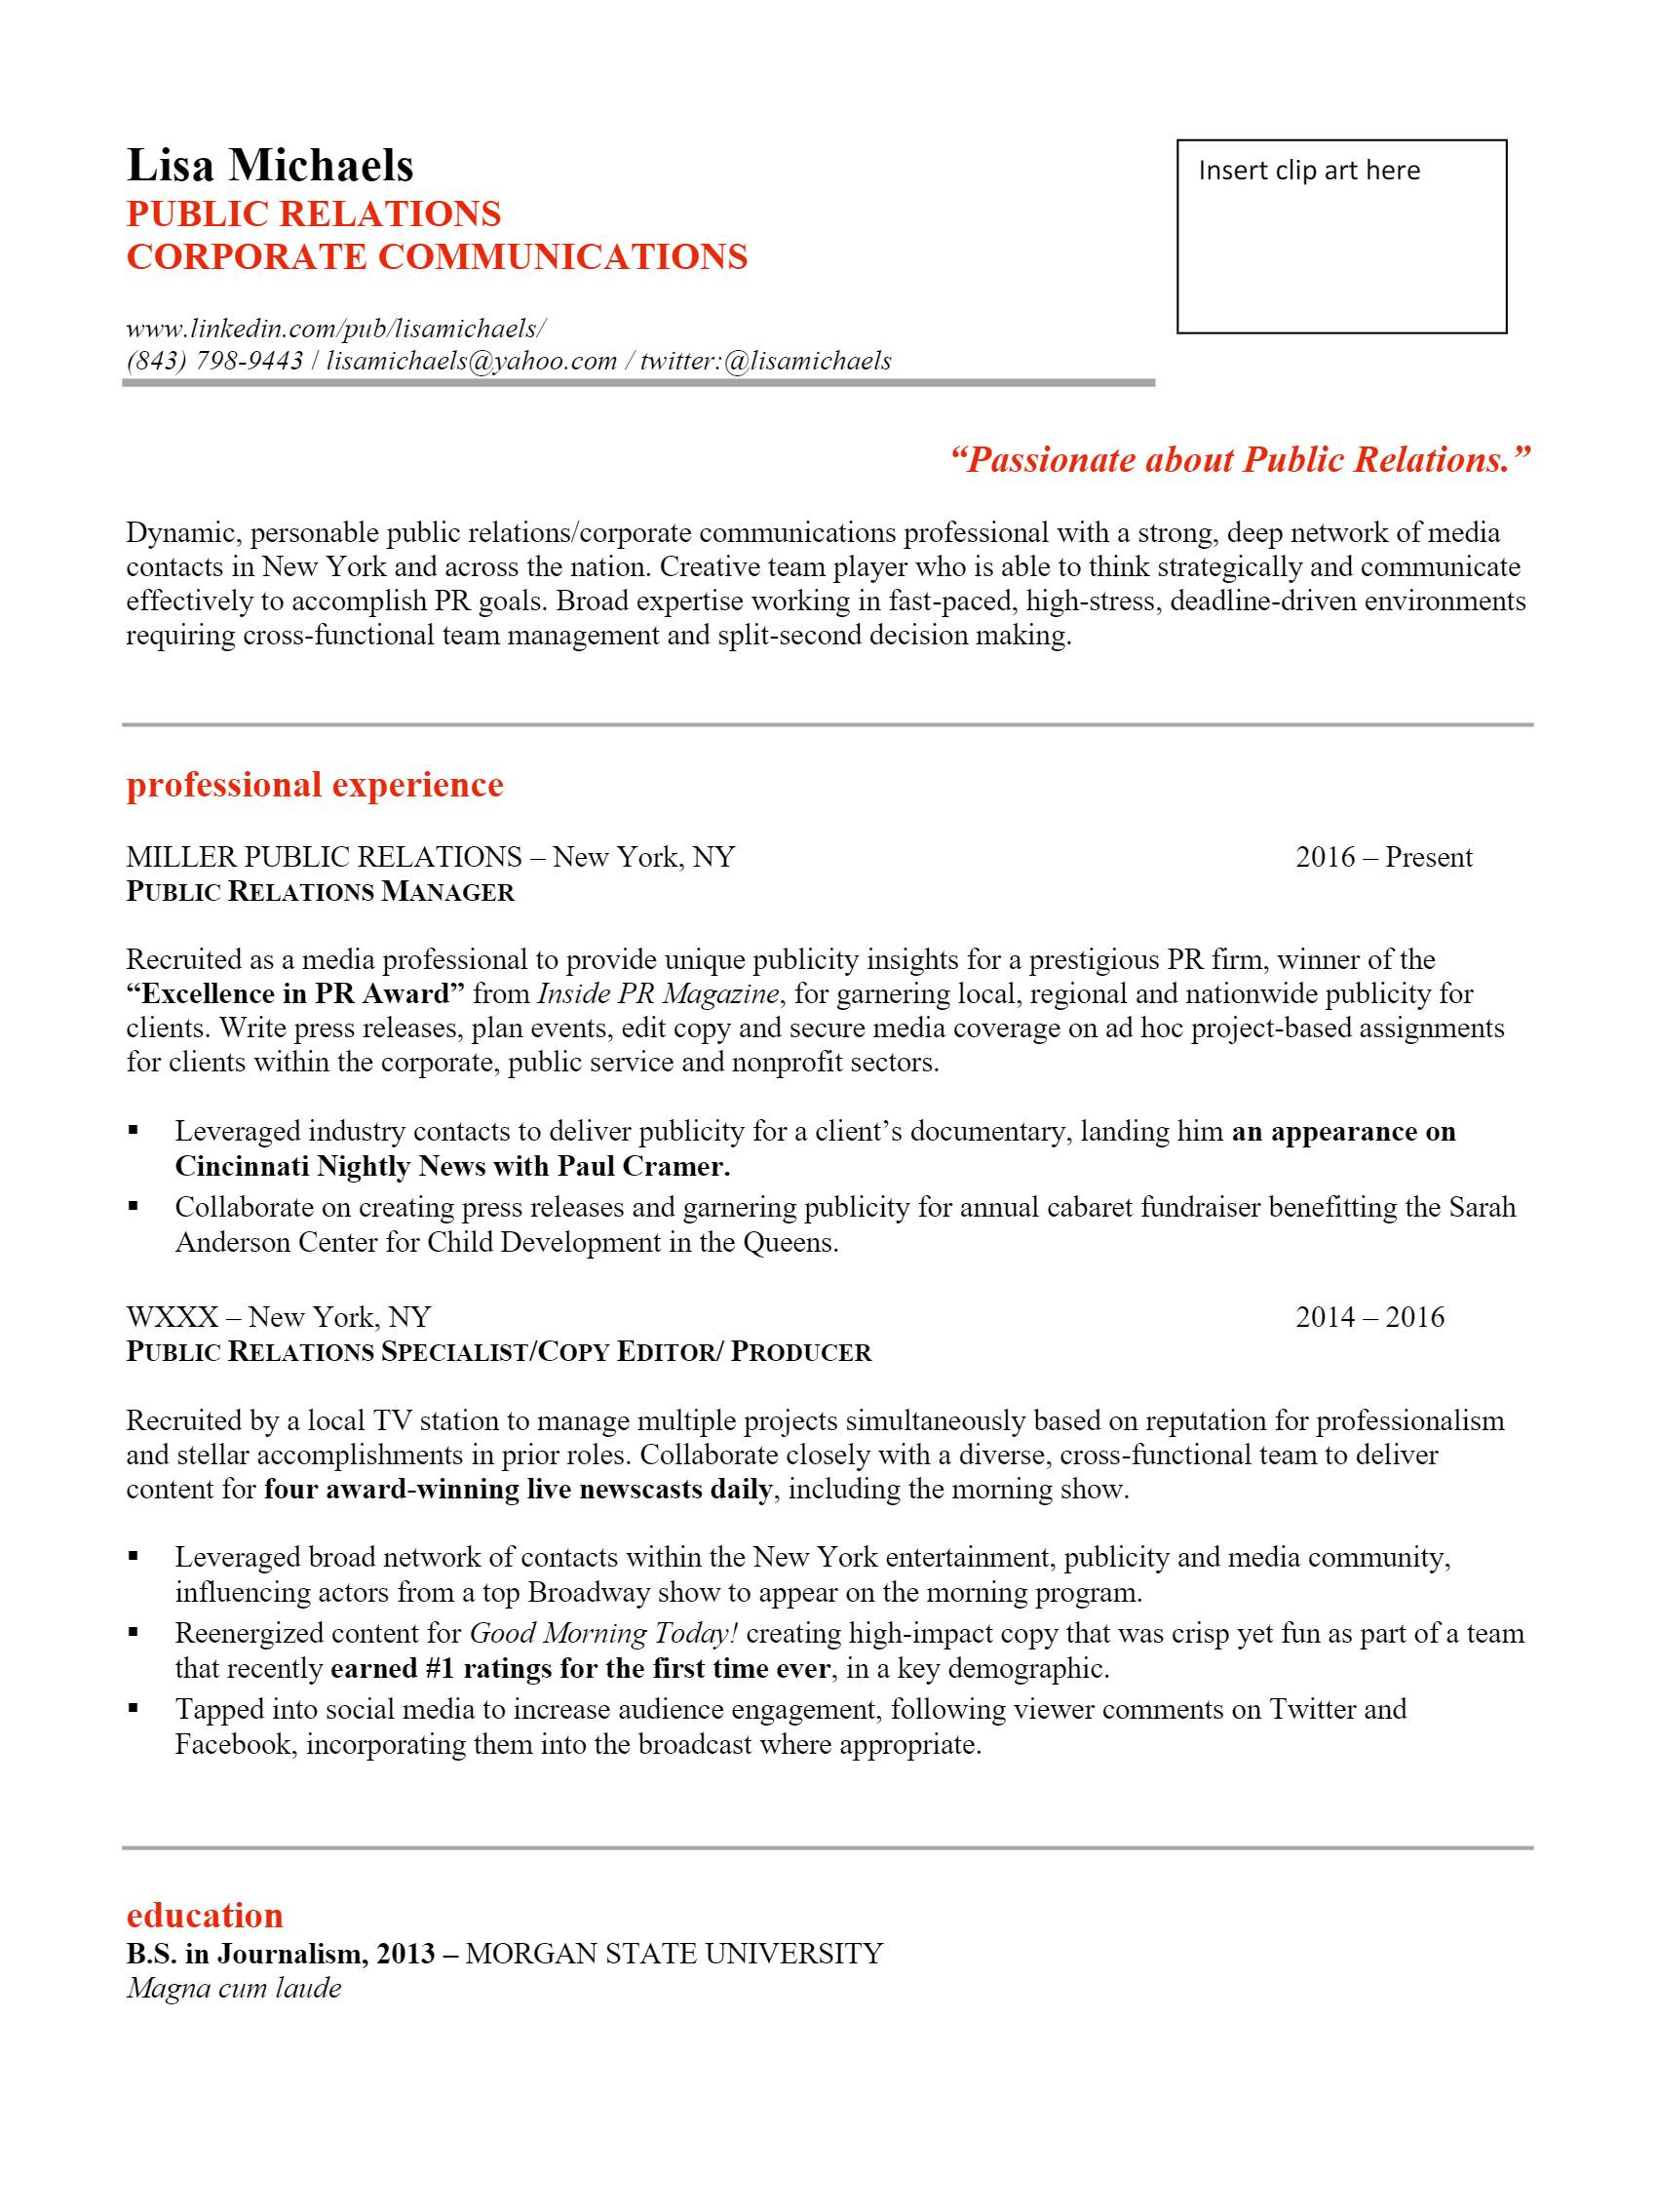 Public Relation Resume > Public Relation Resume .Docx (Word)